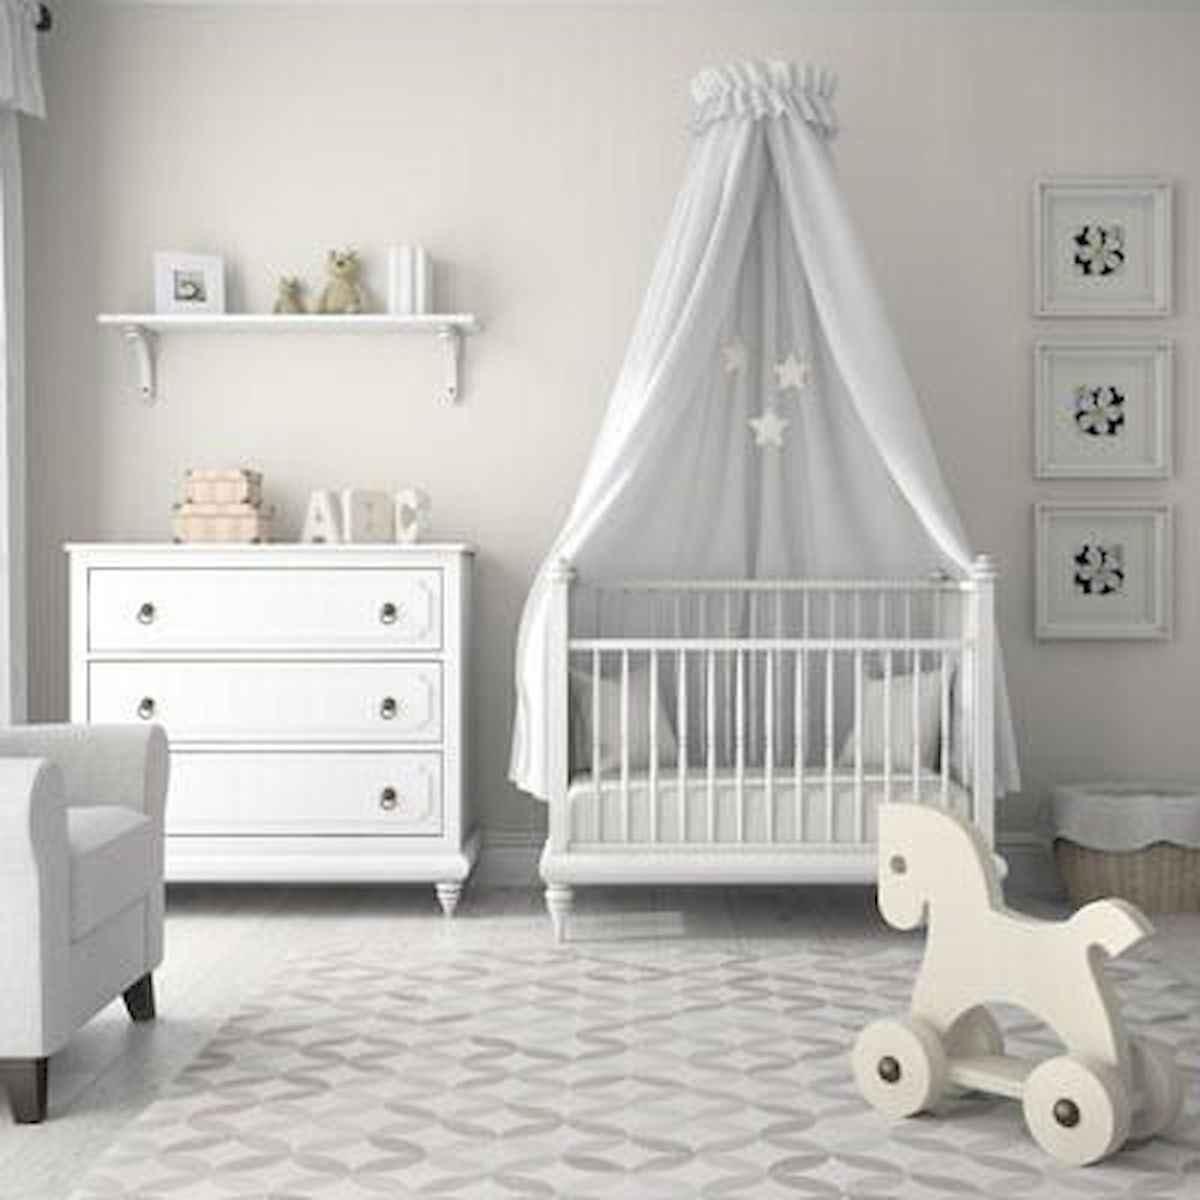 40 Adorable Neutral Nursery Room Ideas Coachdecor